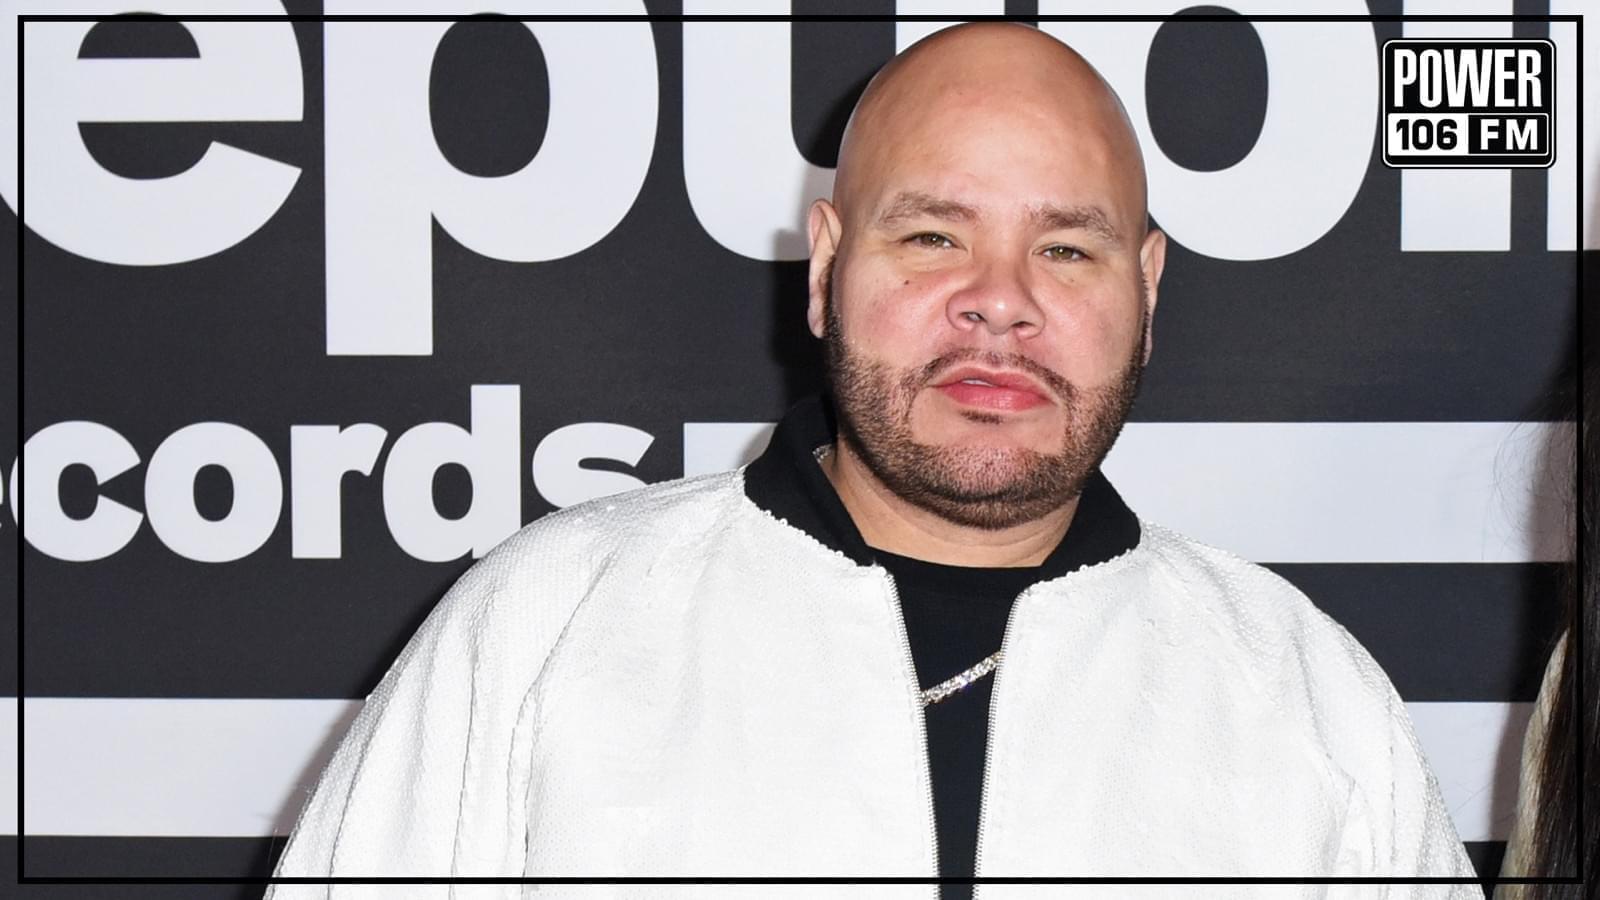 Daily Dose: DJ Felli Fel Discusses Fat Joe Calling Tekashi 69 A Snitch [WATCH]